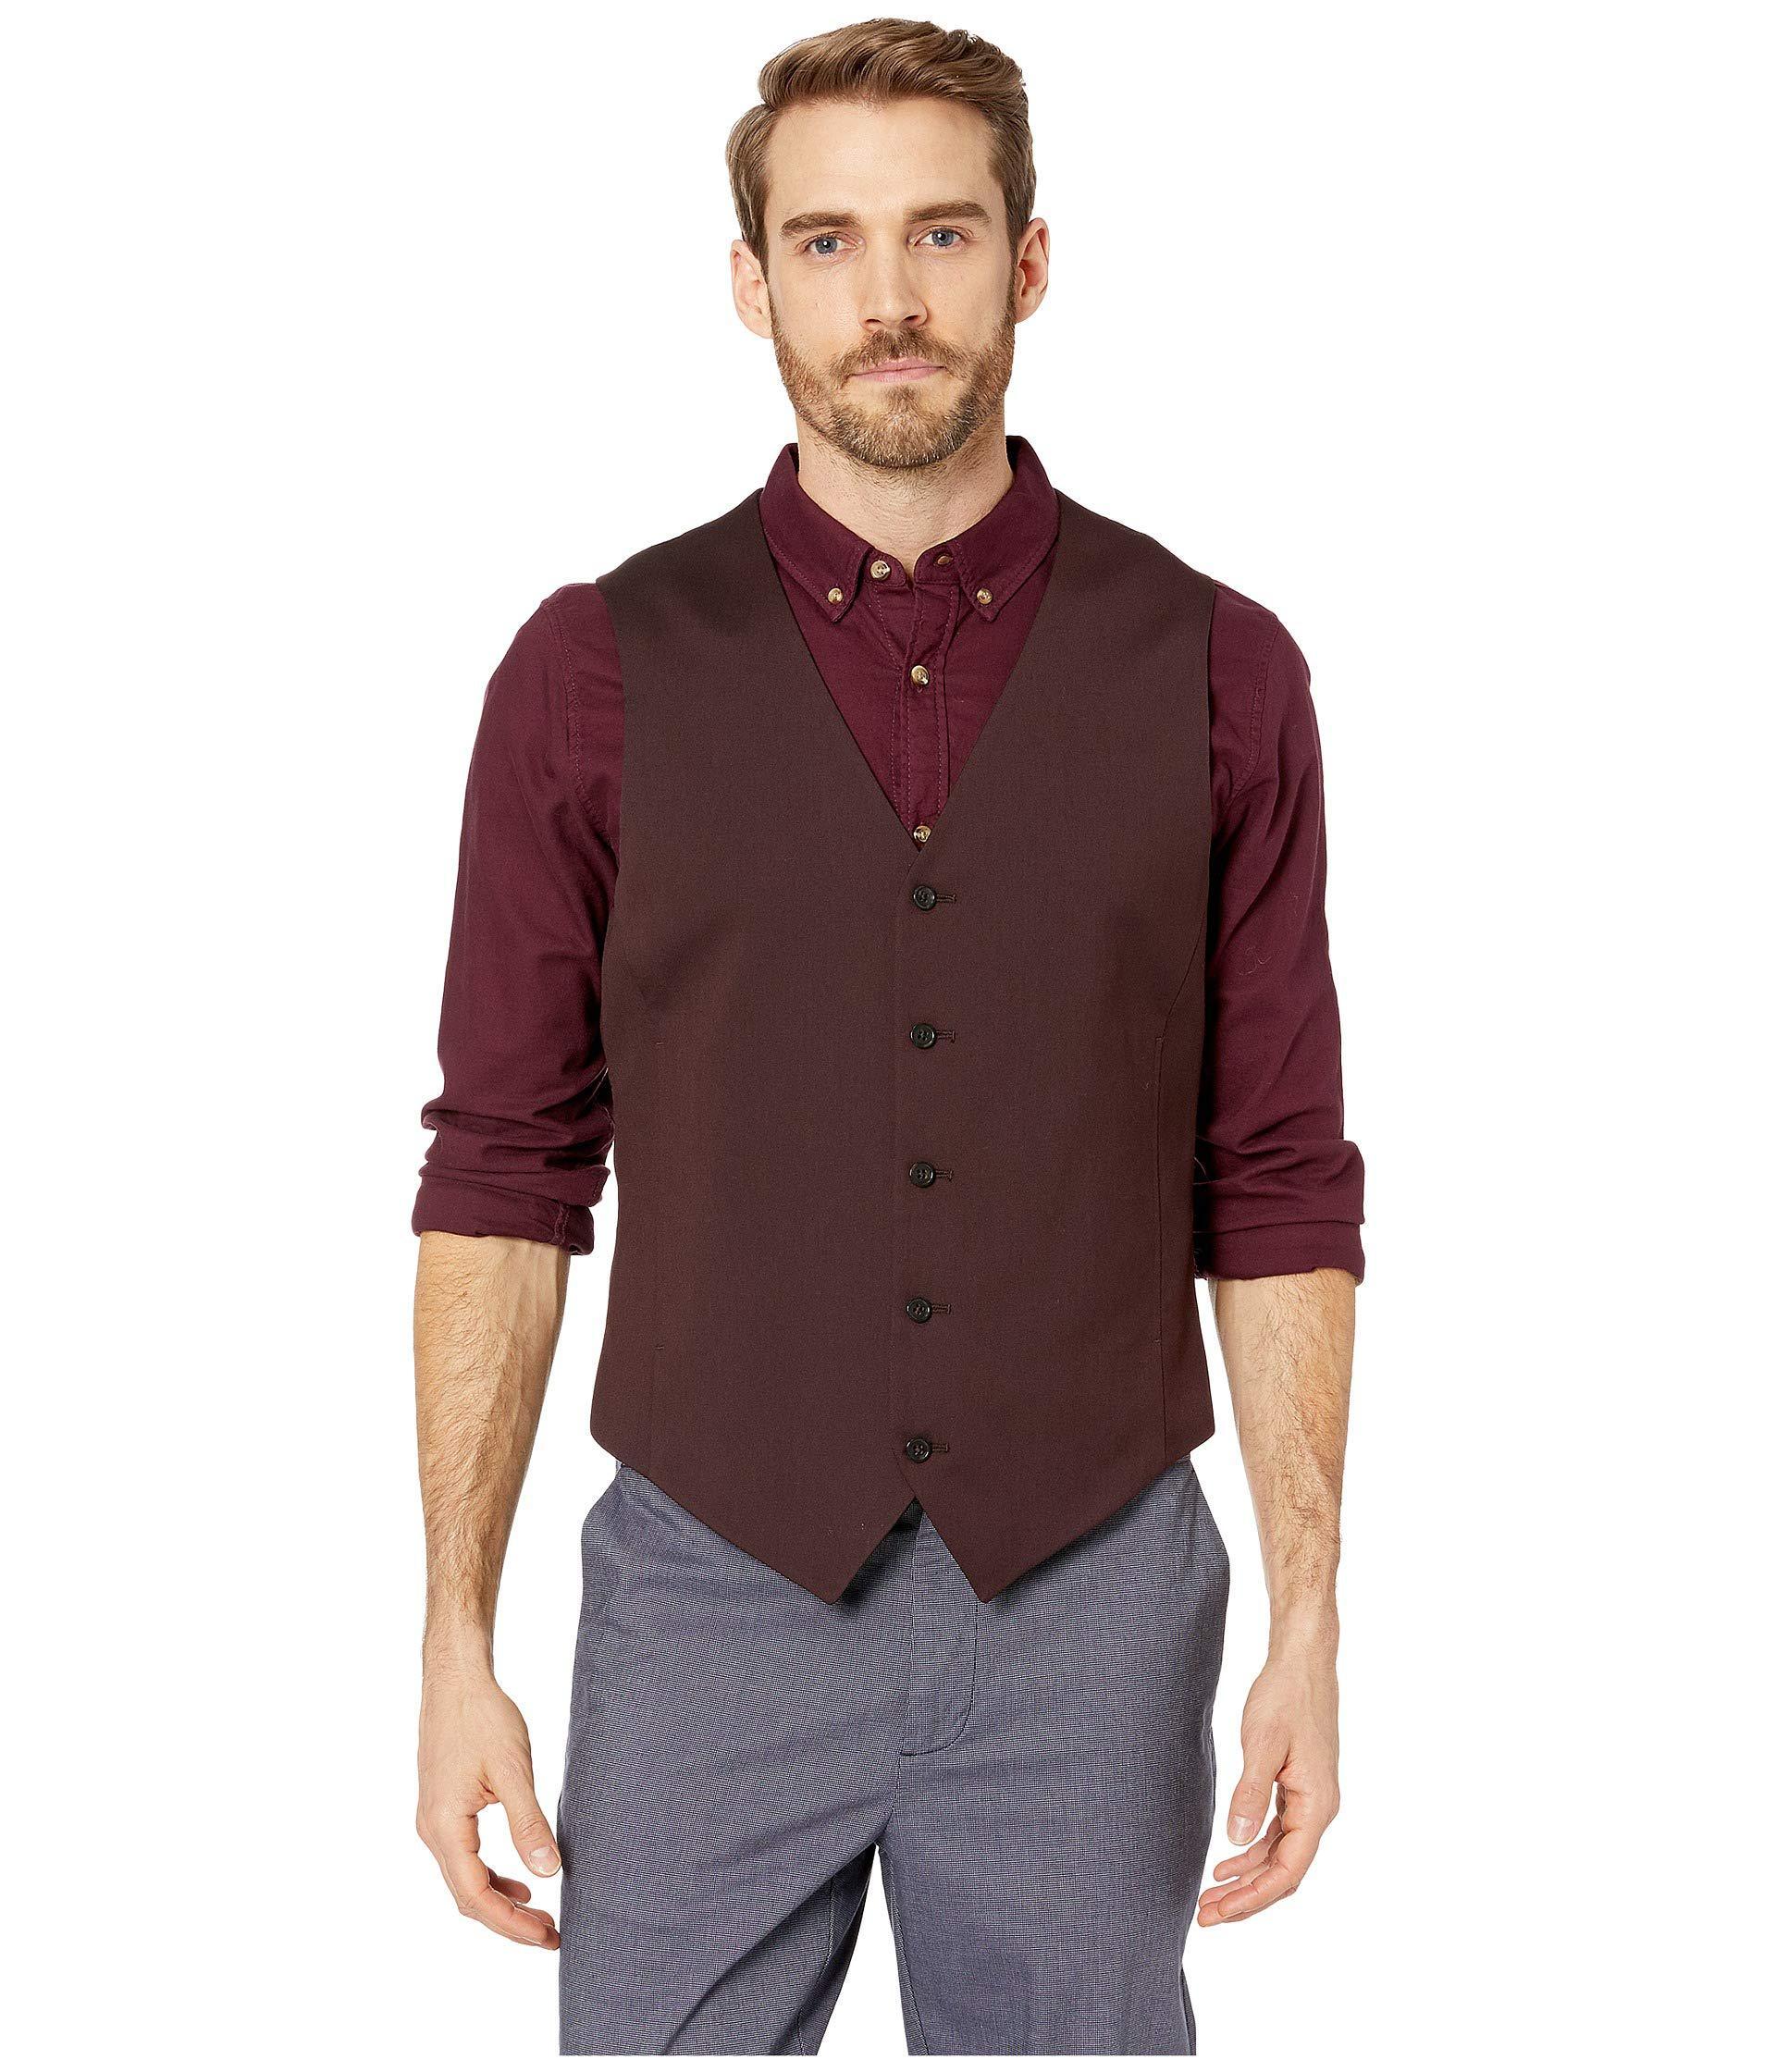 754f9915c4 Lyst - Perry Ellis Slim Fit Stretch Twill Suit Vest (port) Men s ...